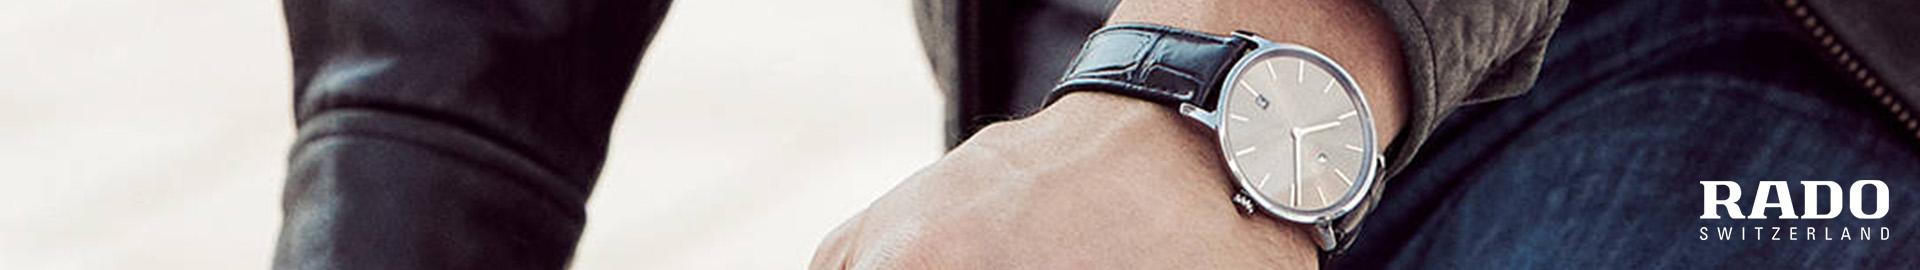 RADO herenhorloges Zazare Diamonds